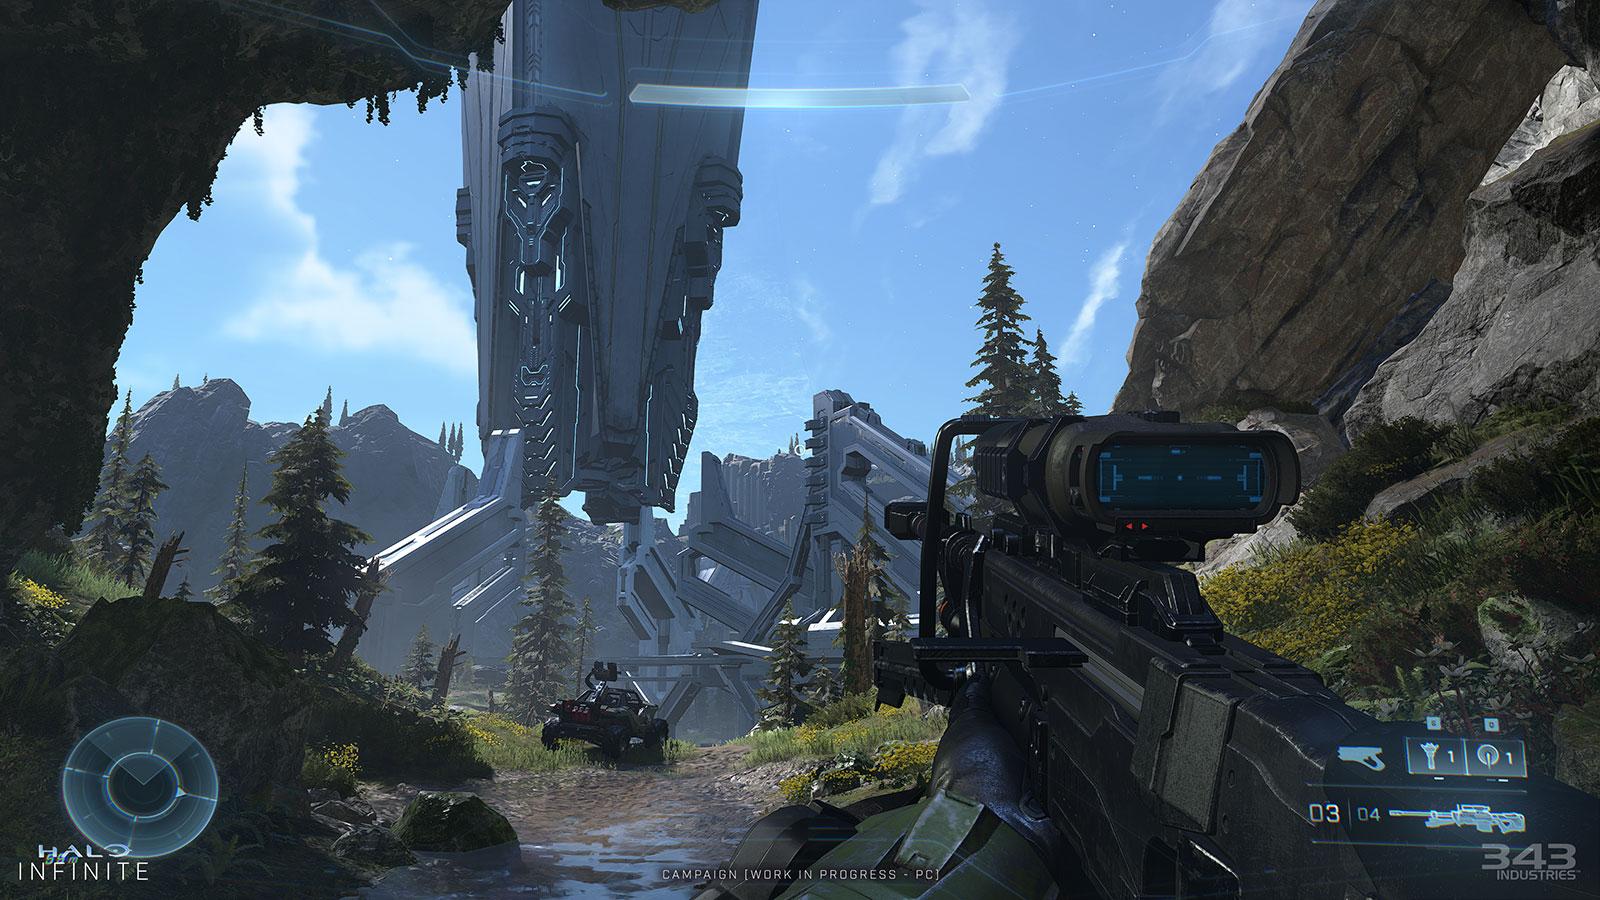 New 'Halo Infinite' screenshots tease a more detailed world